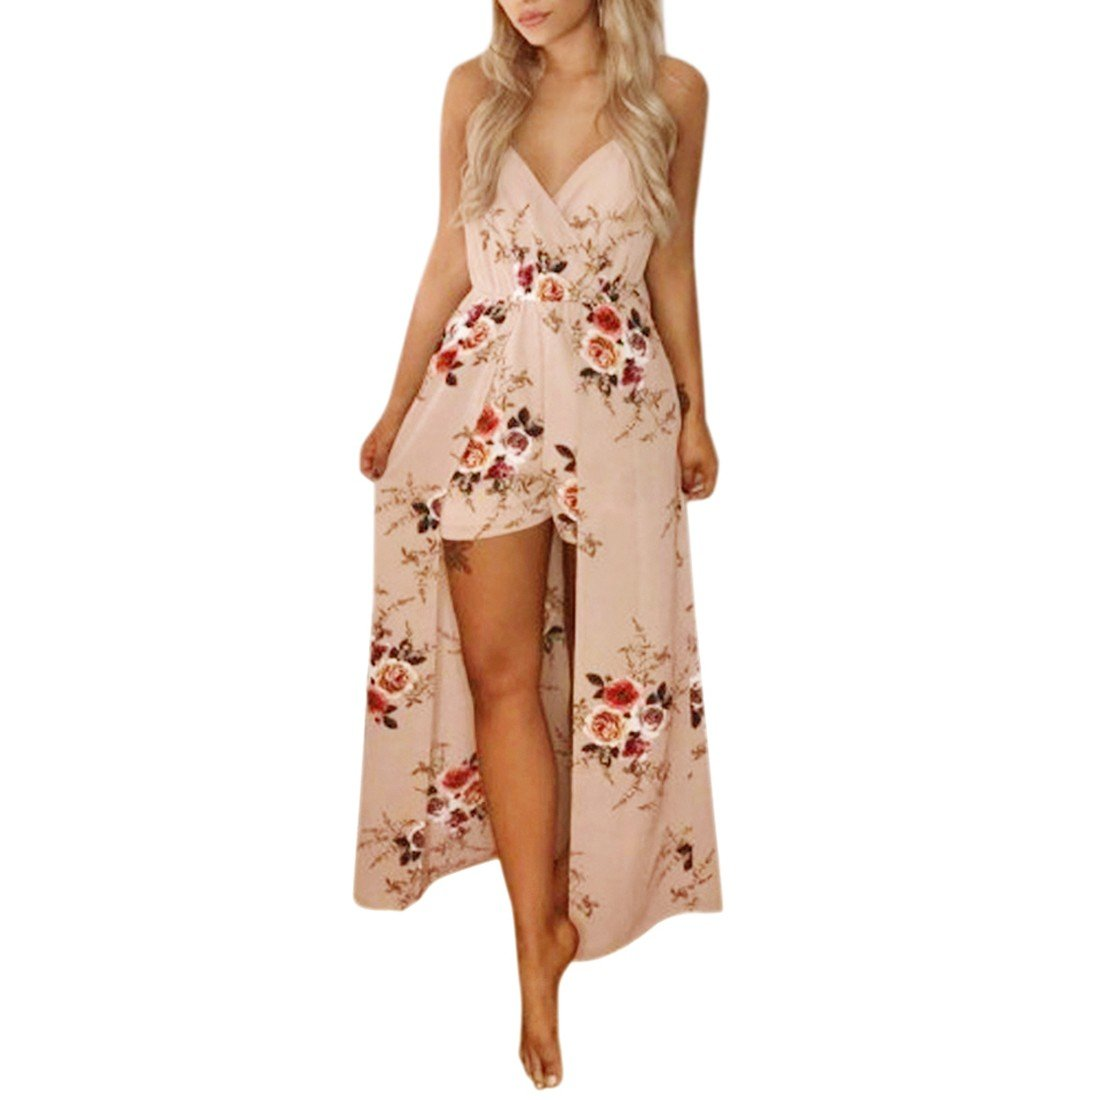 Paixpays Women Summer Short Sleeve Transparent Printed Short Dress White 3012S5617